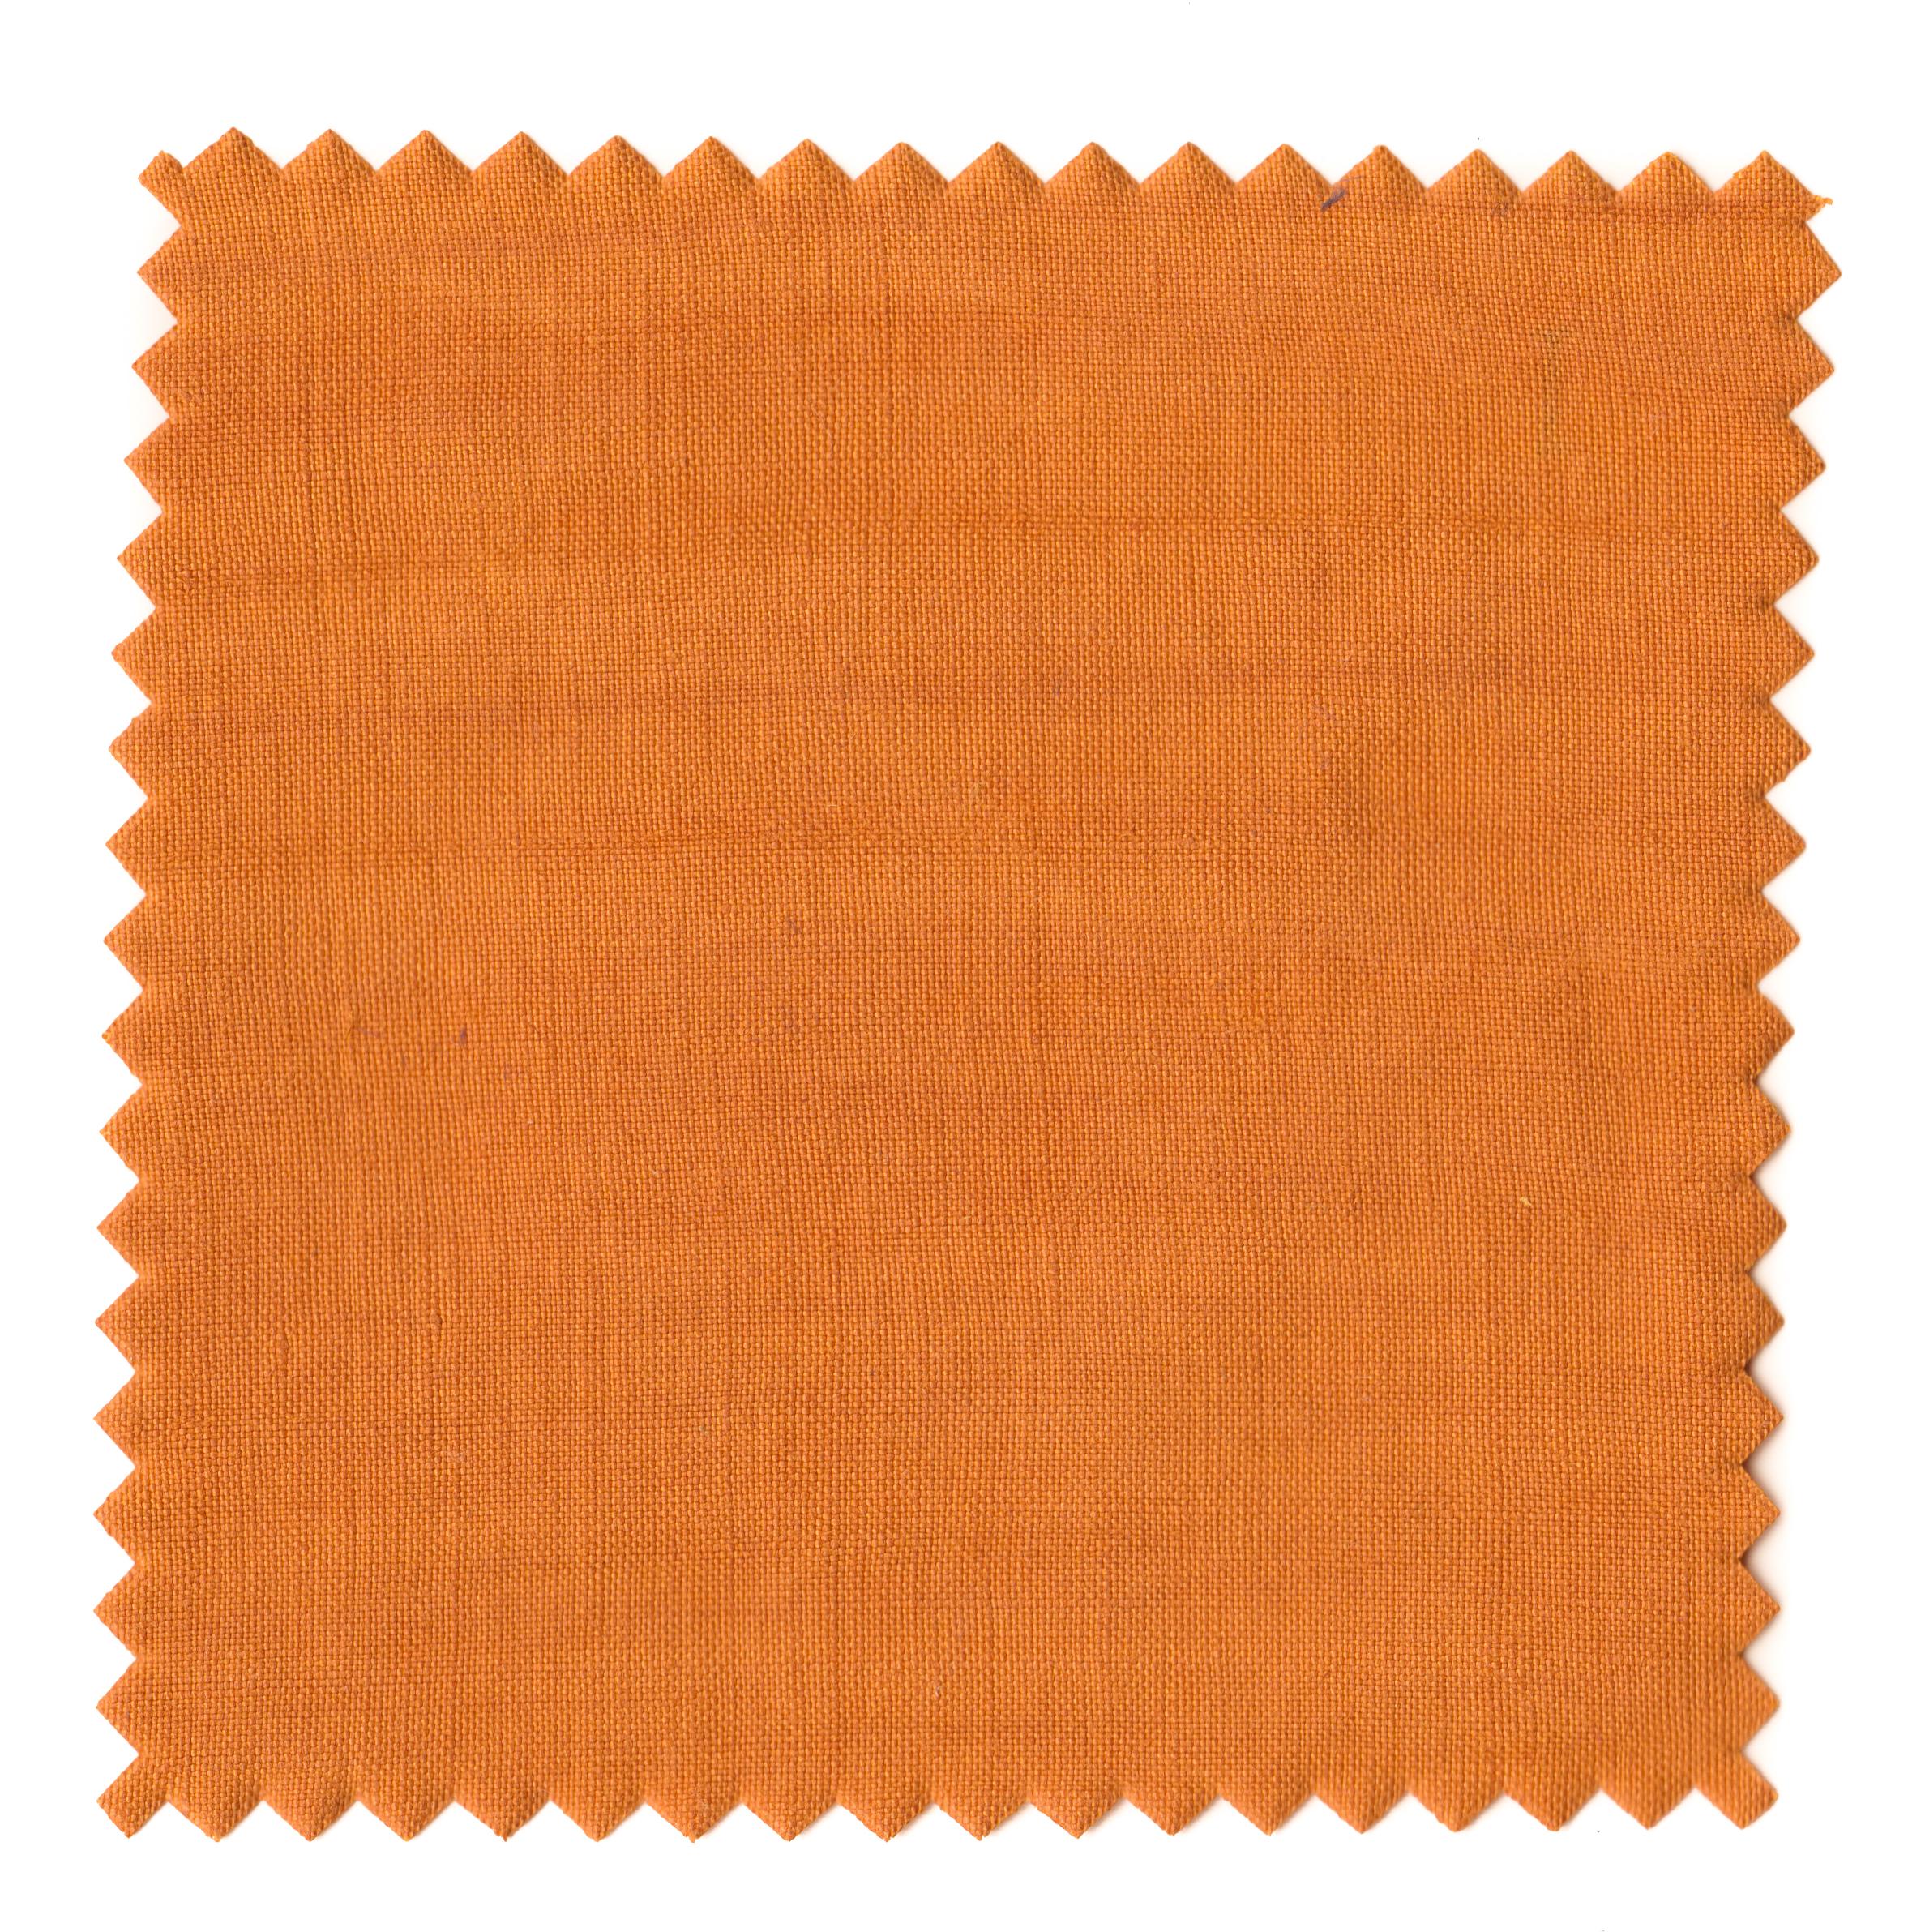 Saffron Umbers-1.jpg